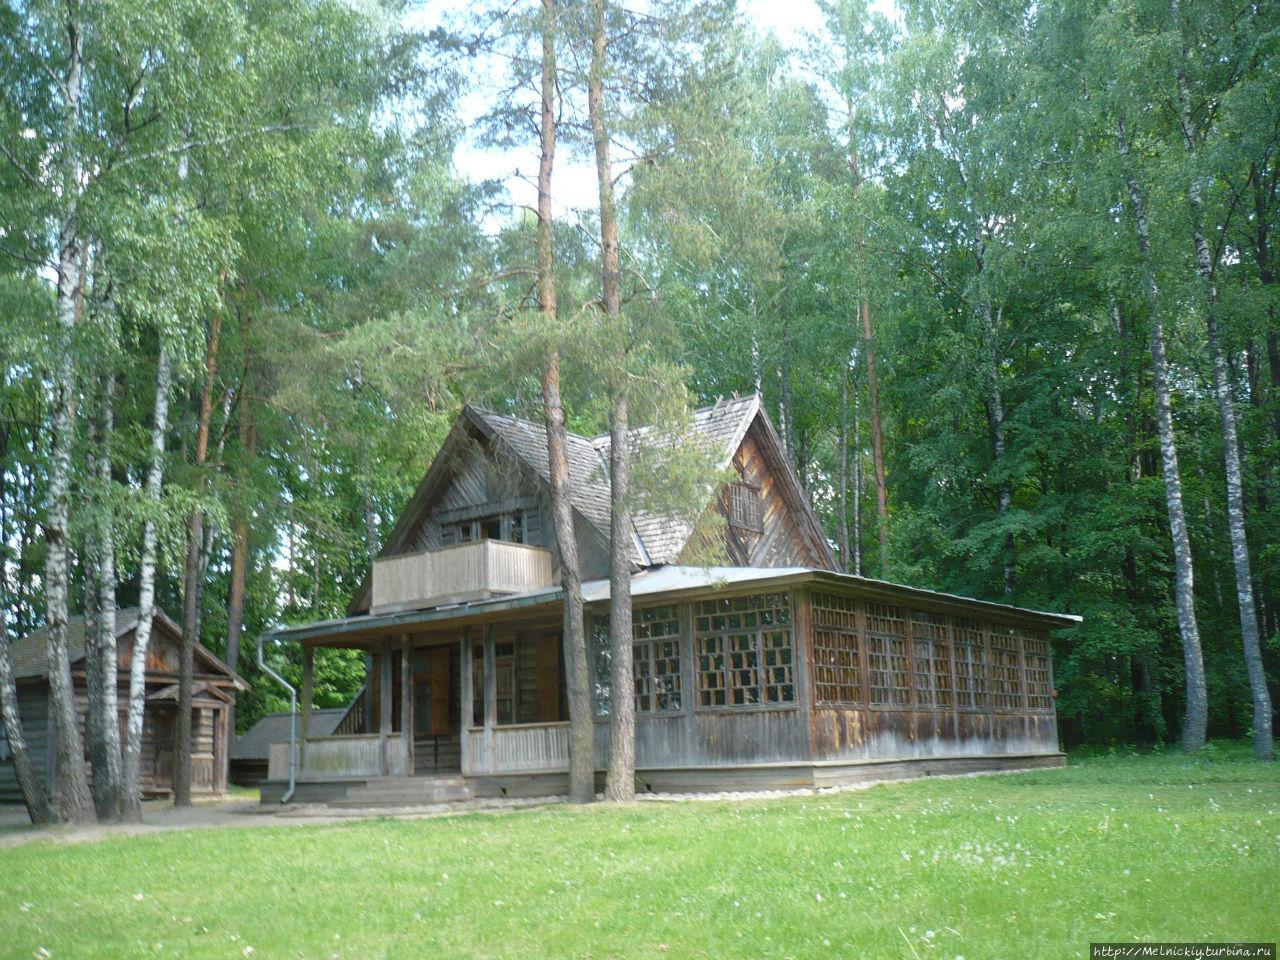 Дача-музей Янки Купалы Копысь, Беларусь